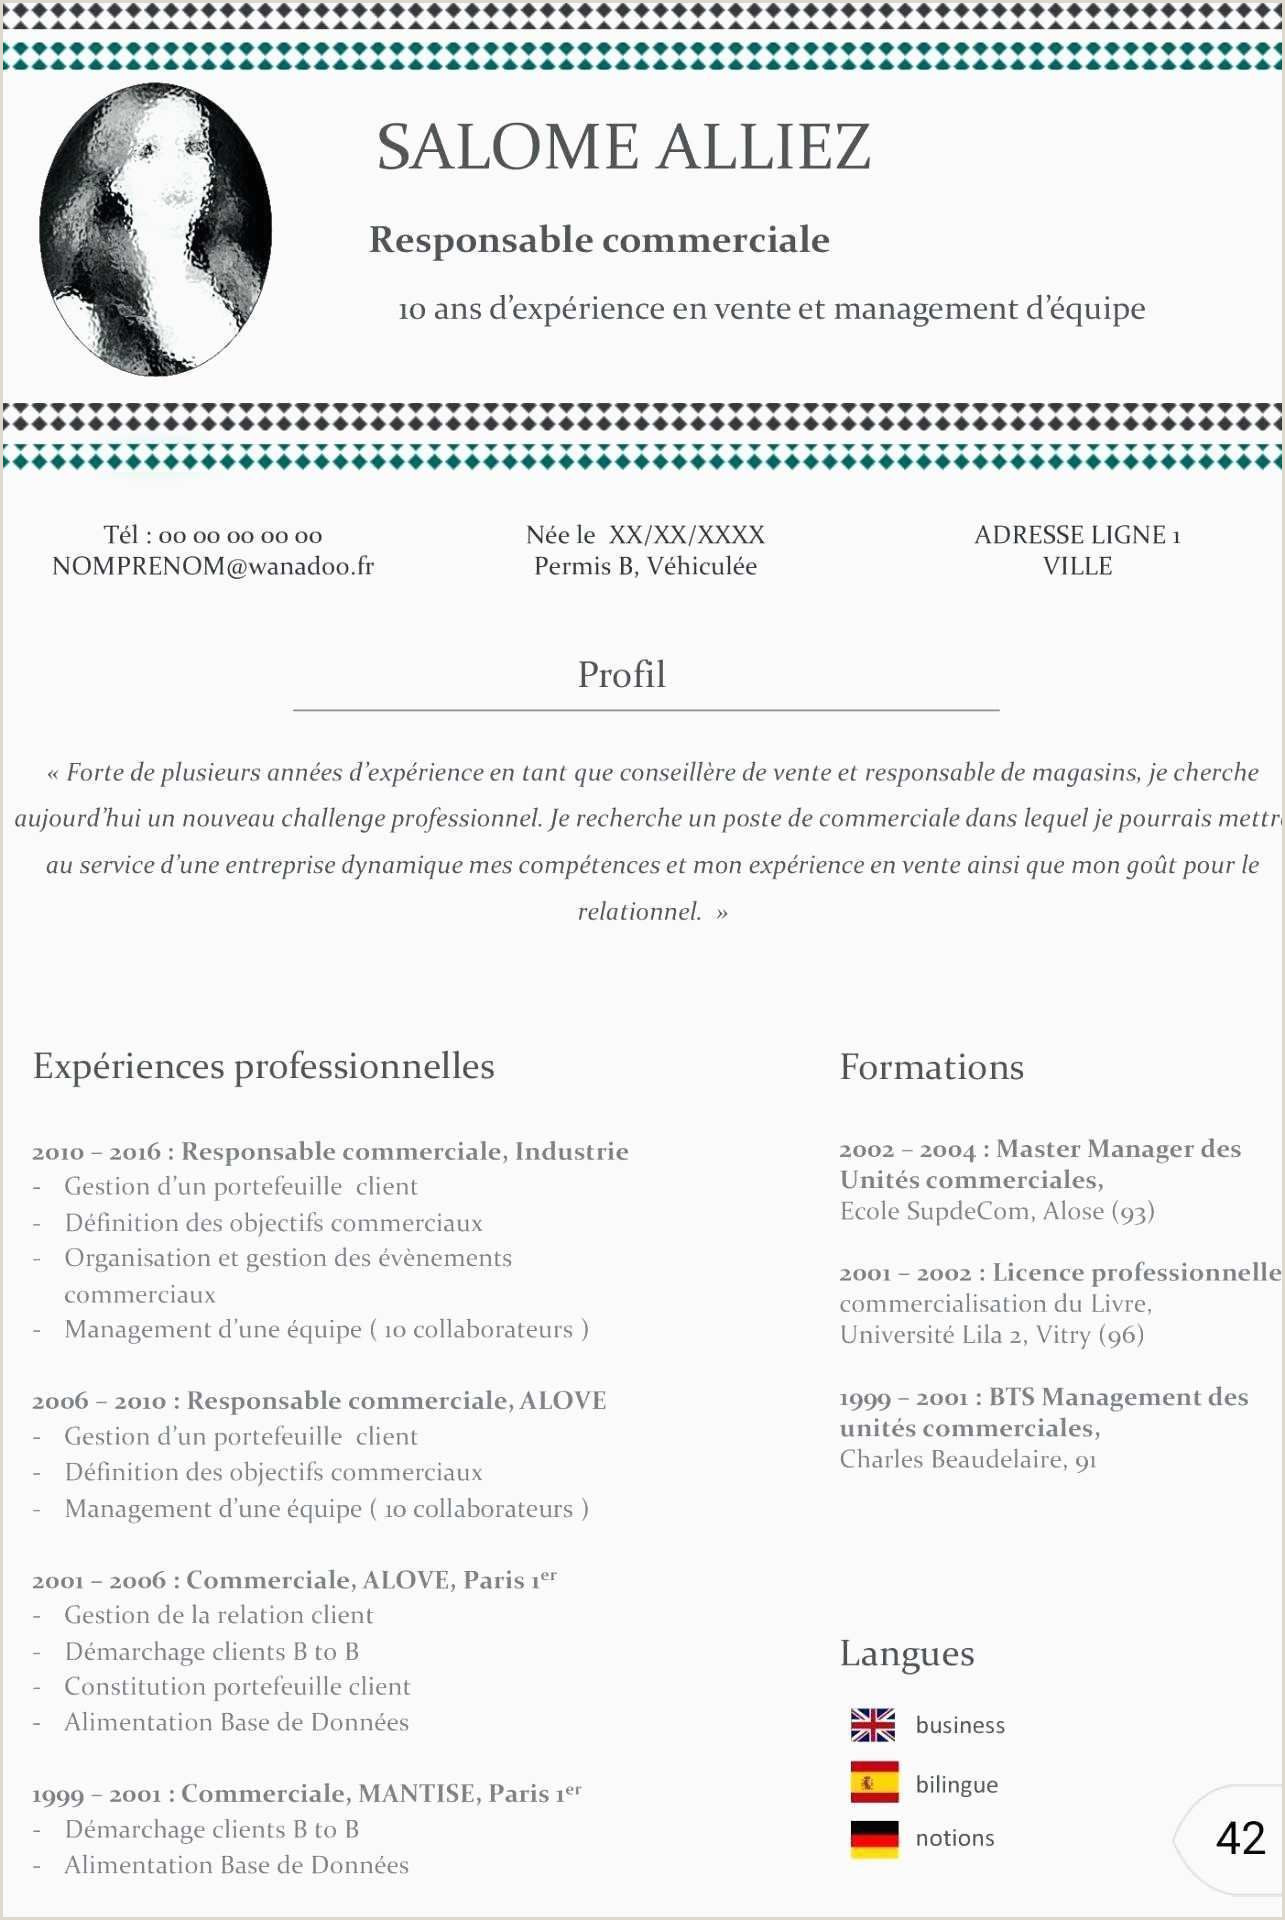 Exemple De Cv Commercial Pdf Cvresponsable Mercialbilingueupcvup Travail Mercial